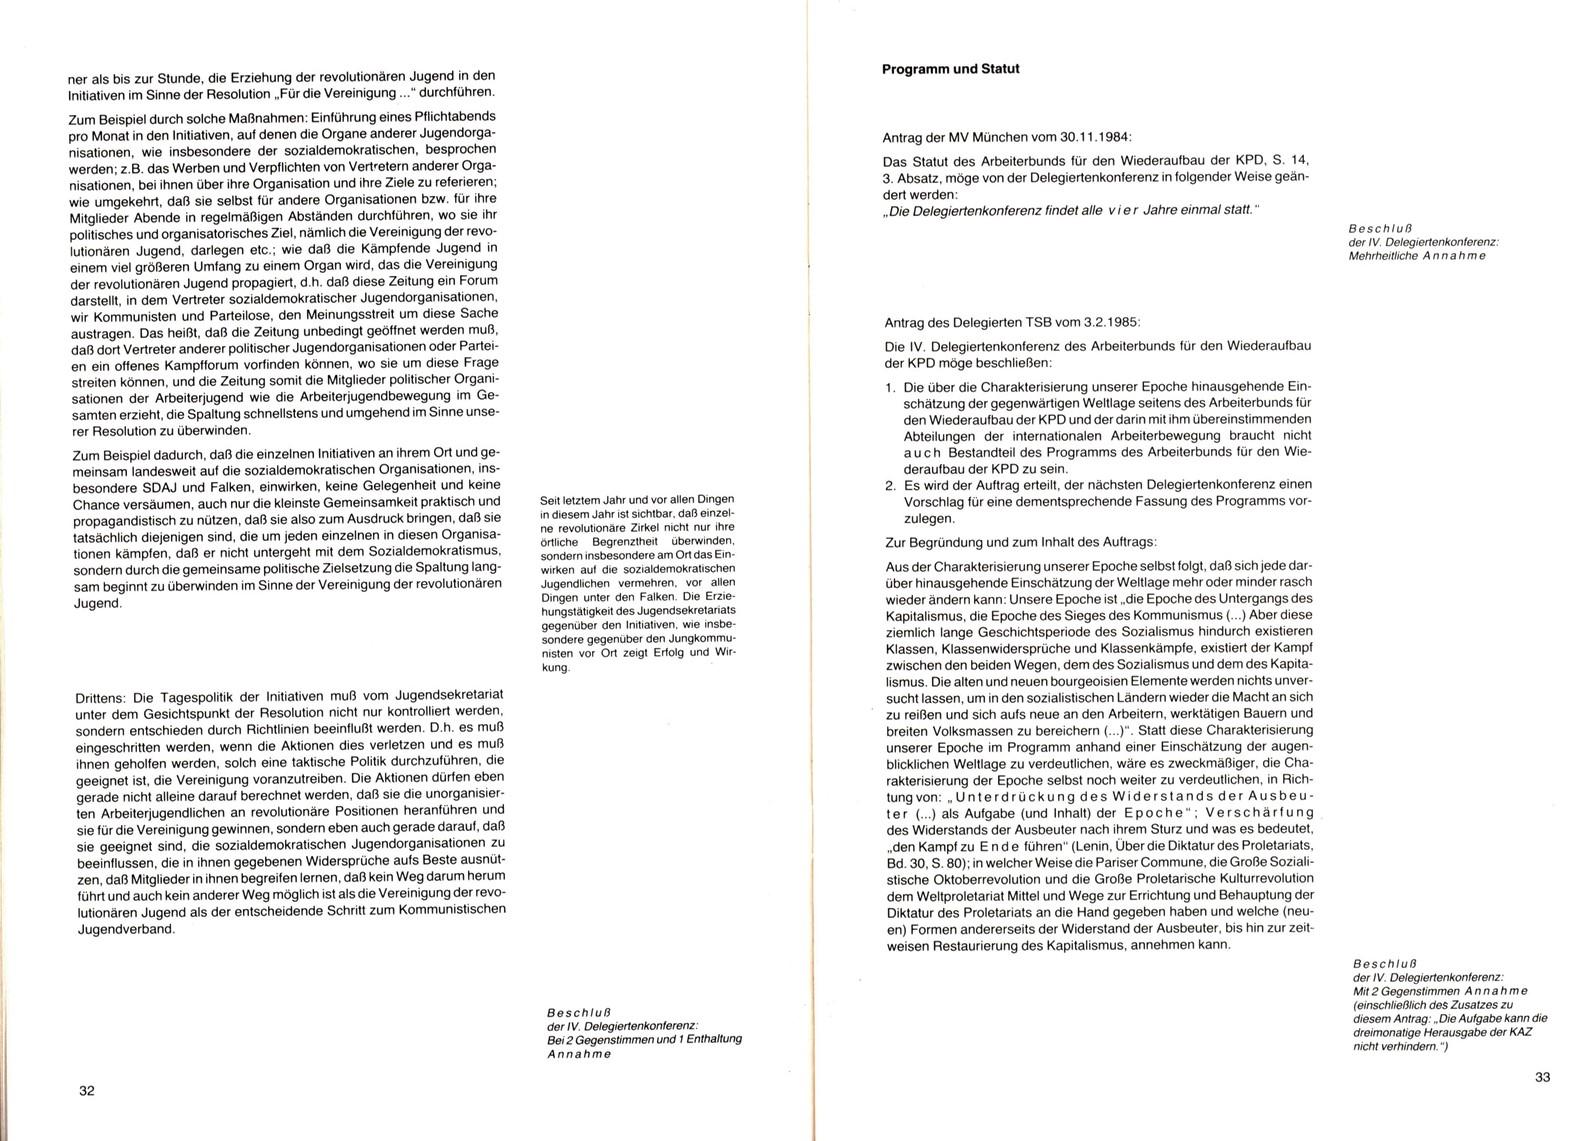 ABG_1985_Beschluesse_IV_Delegiertenkonferenz_18